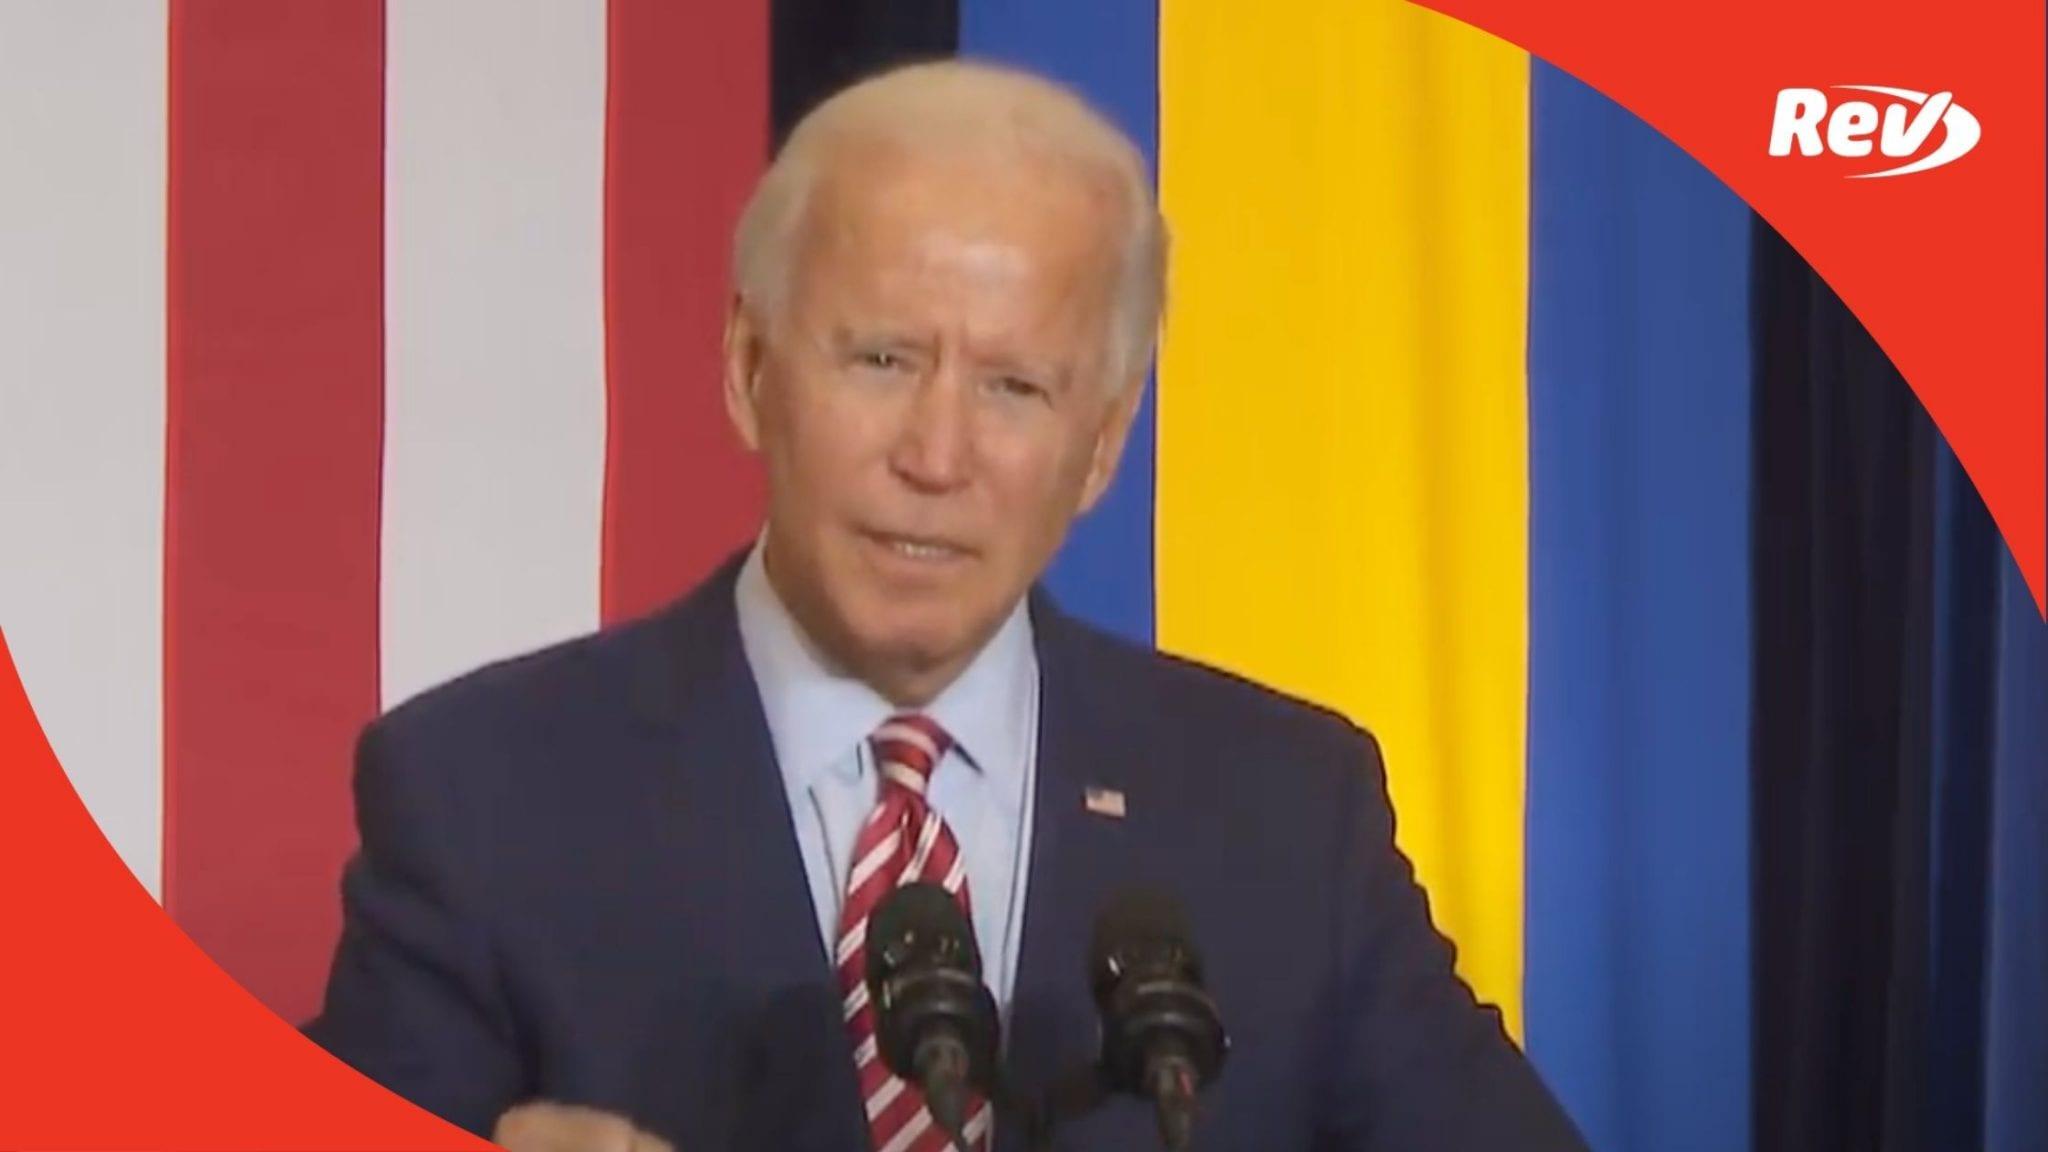 Joe Biden Hispanic Heritage Month Event Speech Transcript September 15